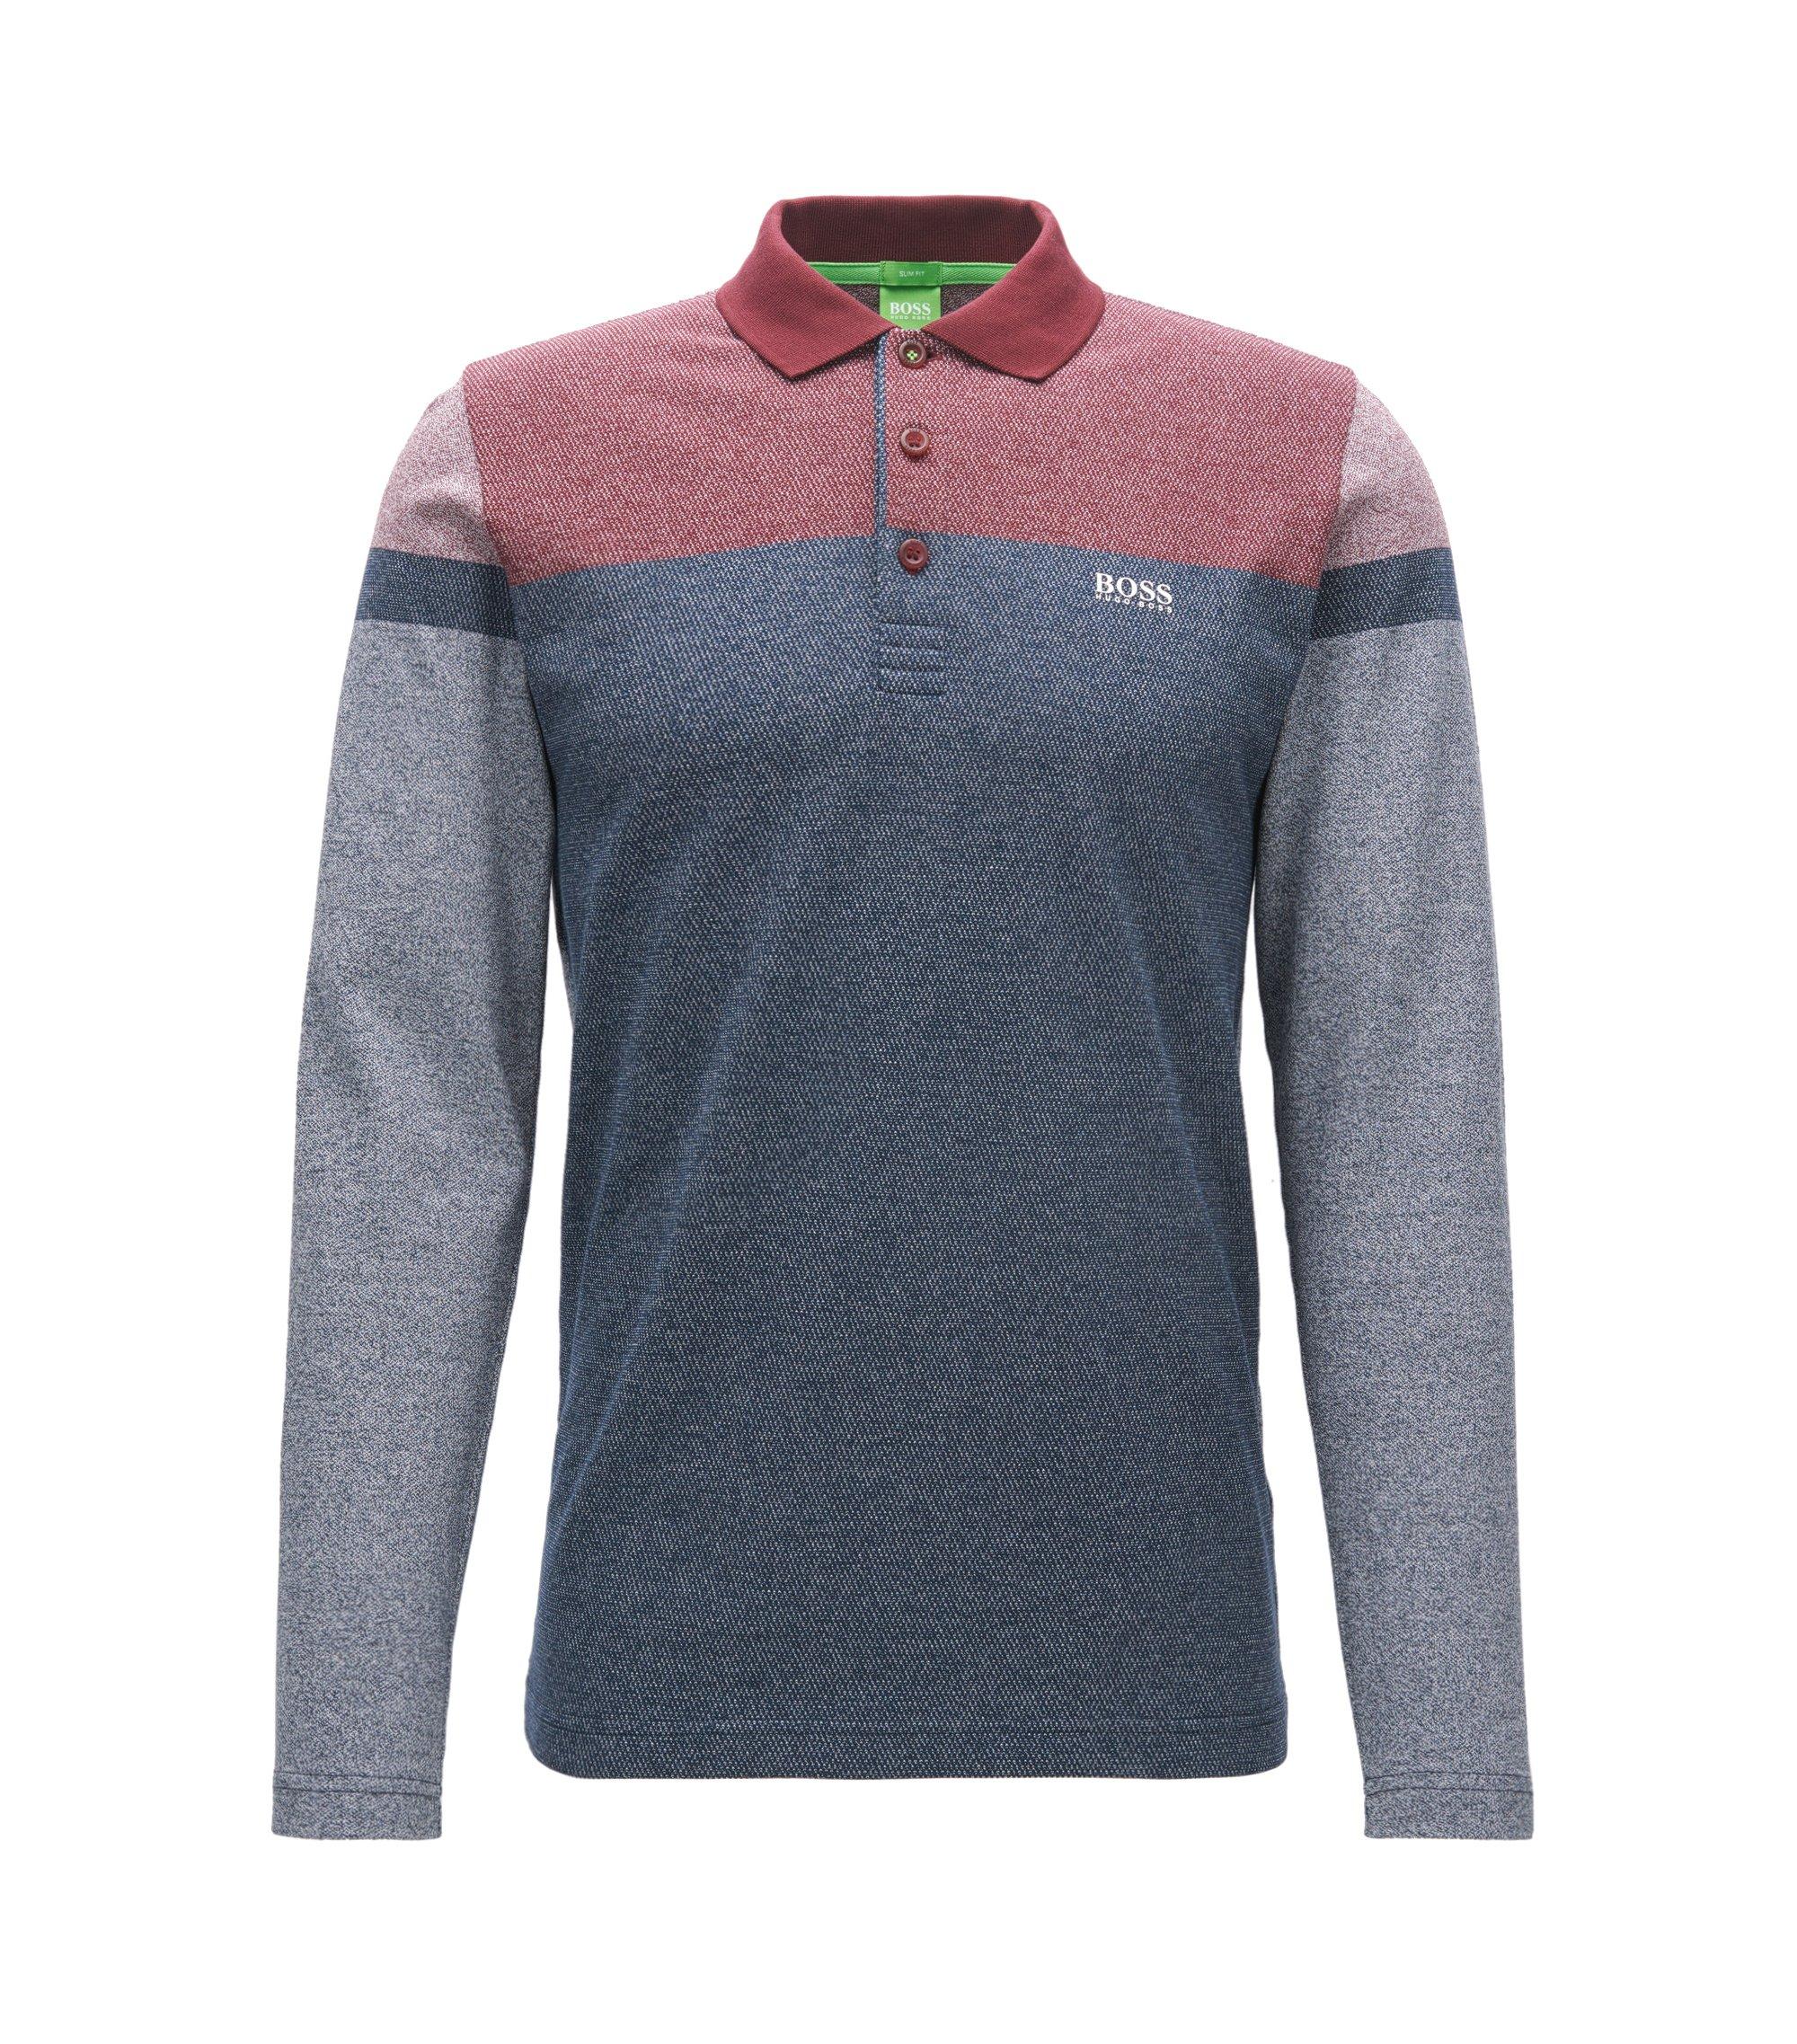 Colorblocked Cotton Polo Shirt, Slim Fit | Pleesy, Dark Blue